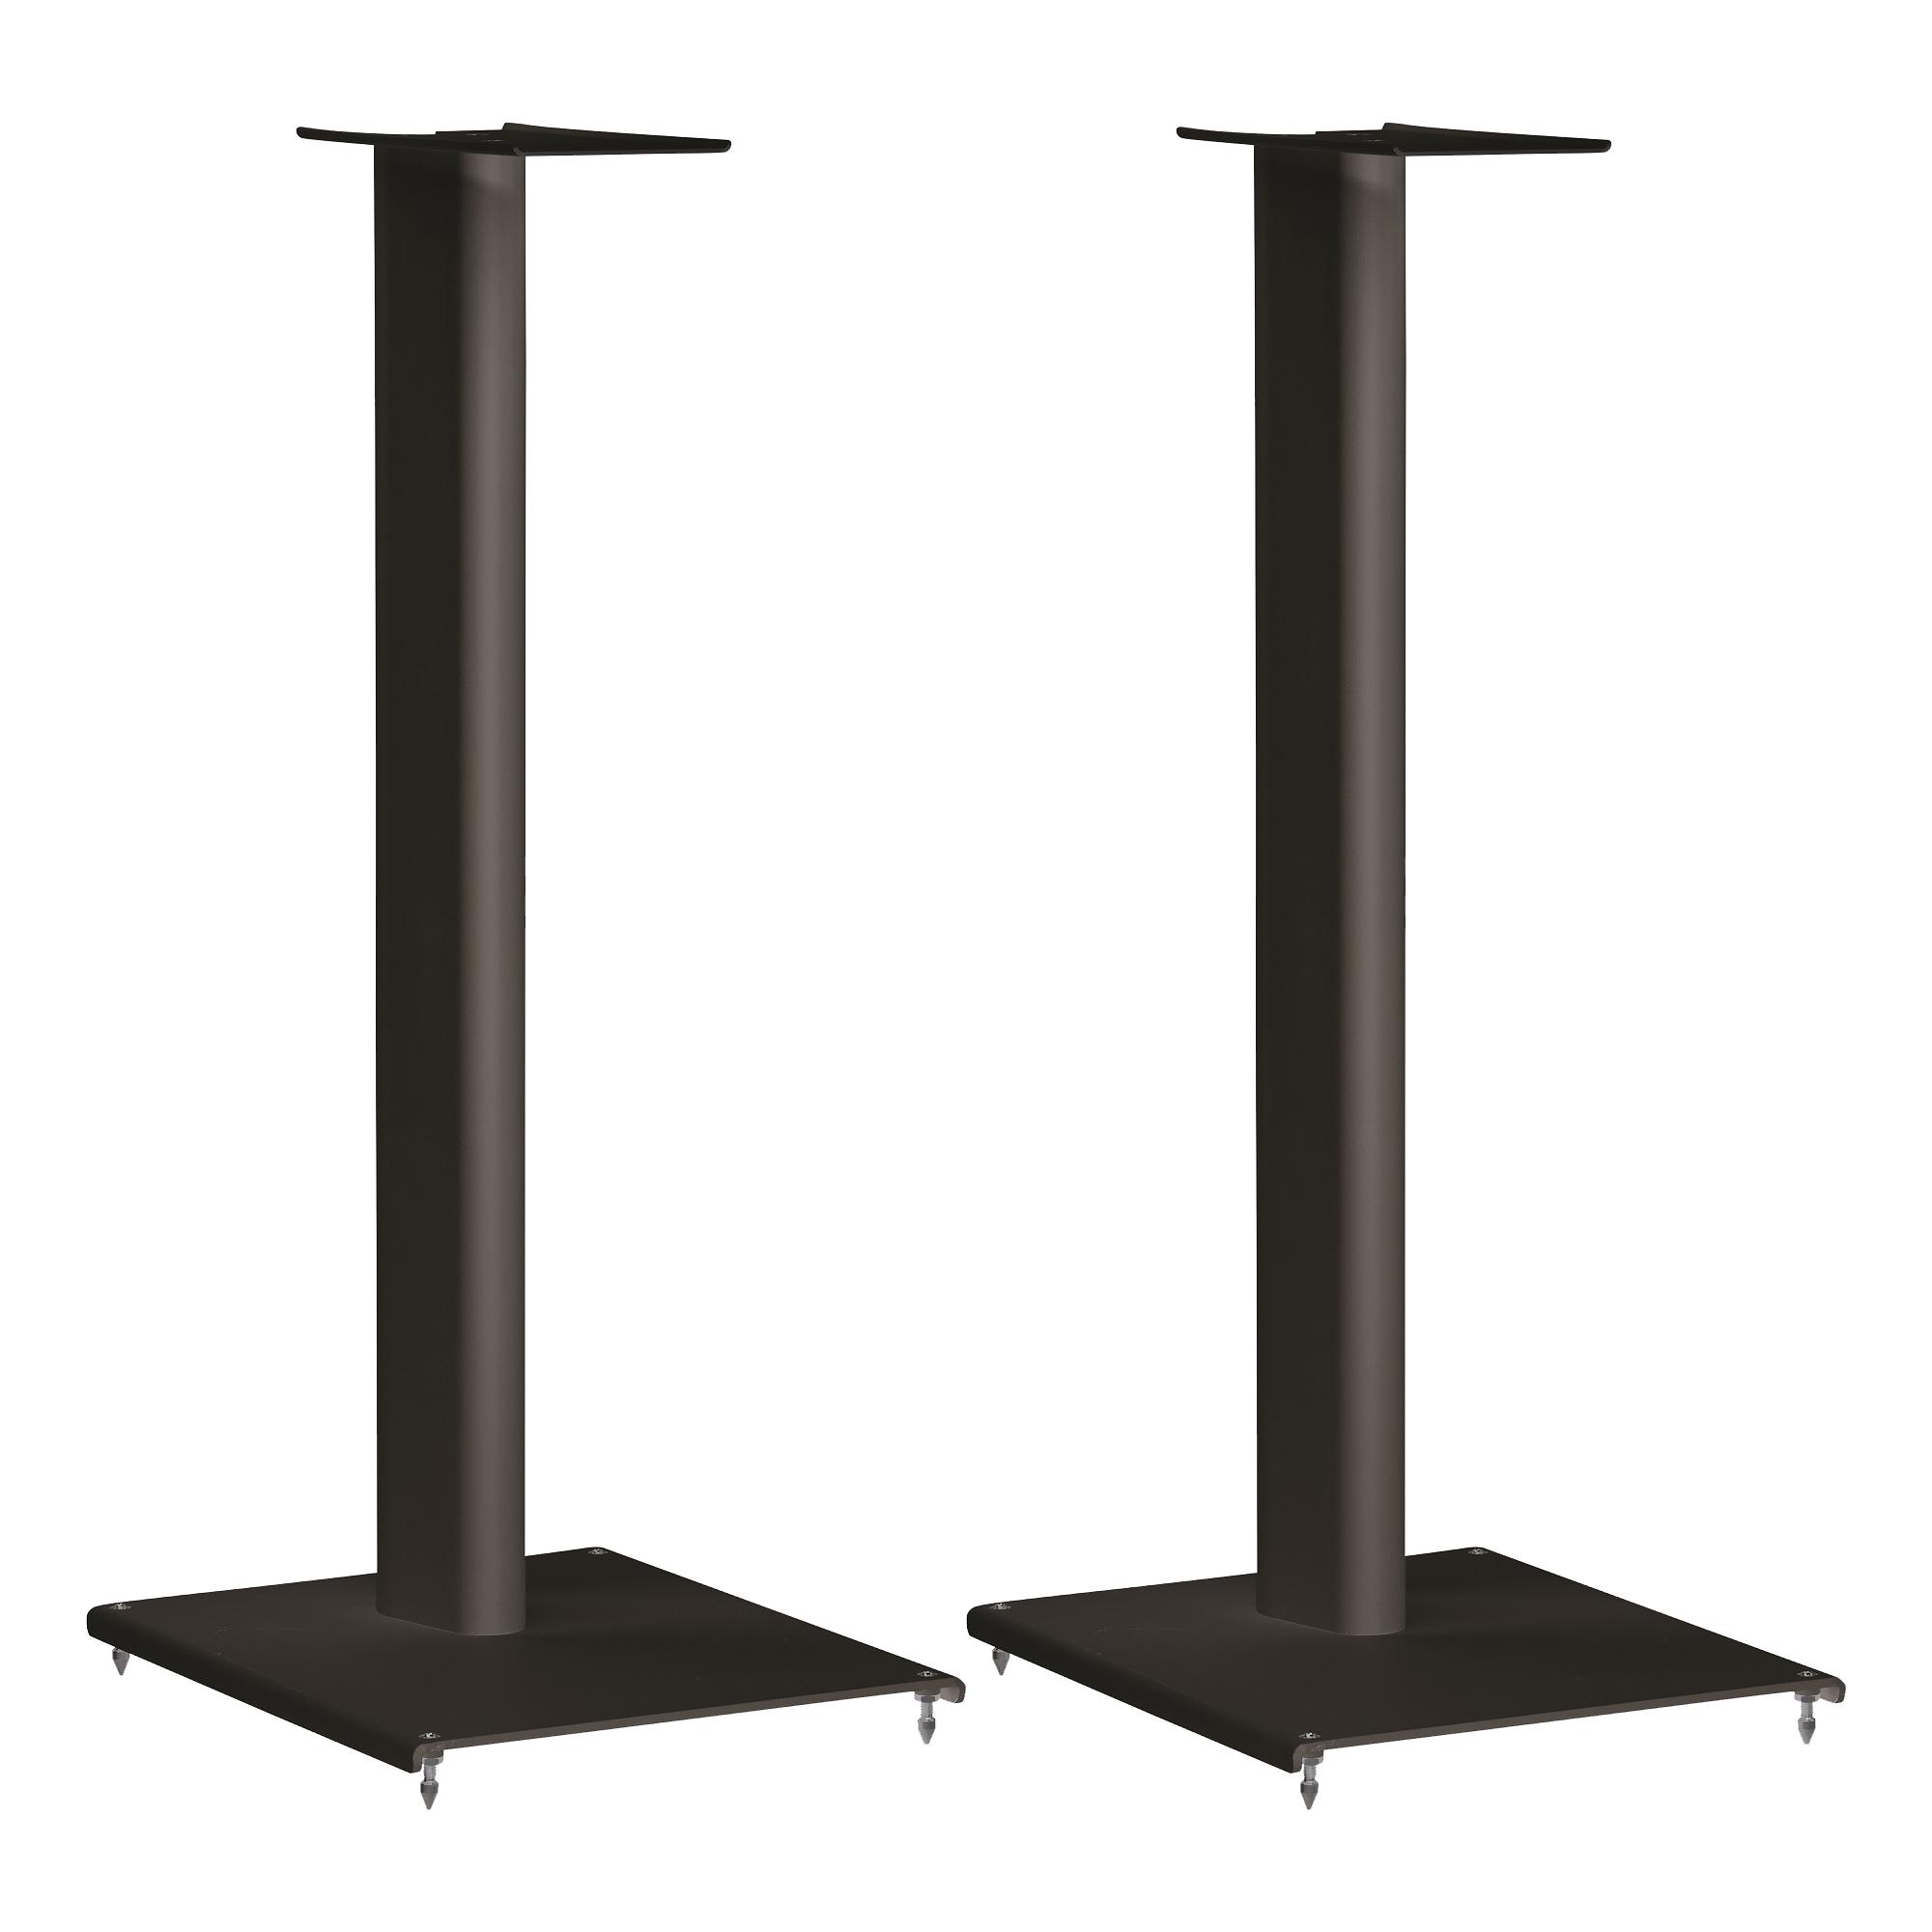 Q Acoustics 3000 Series Speaker Stand Pair Black by Q Acoustics